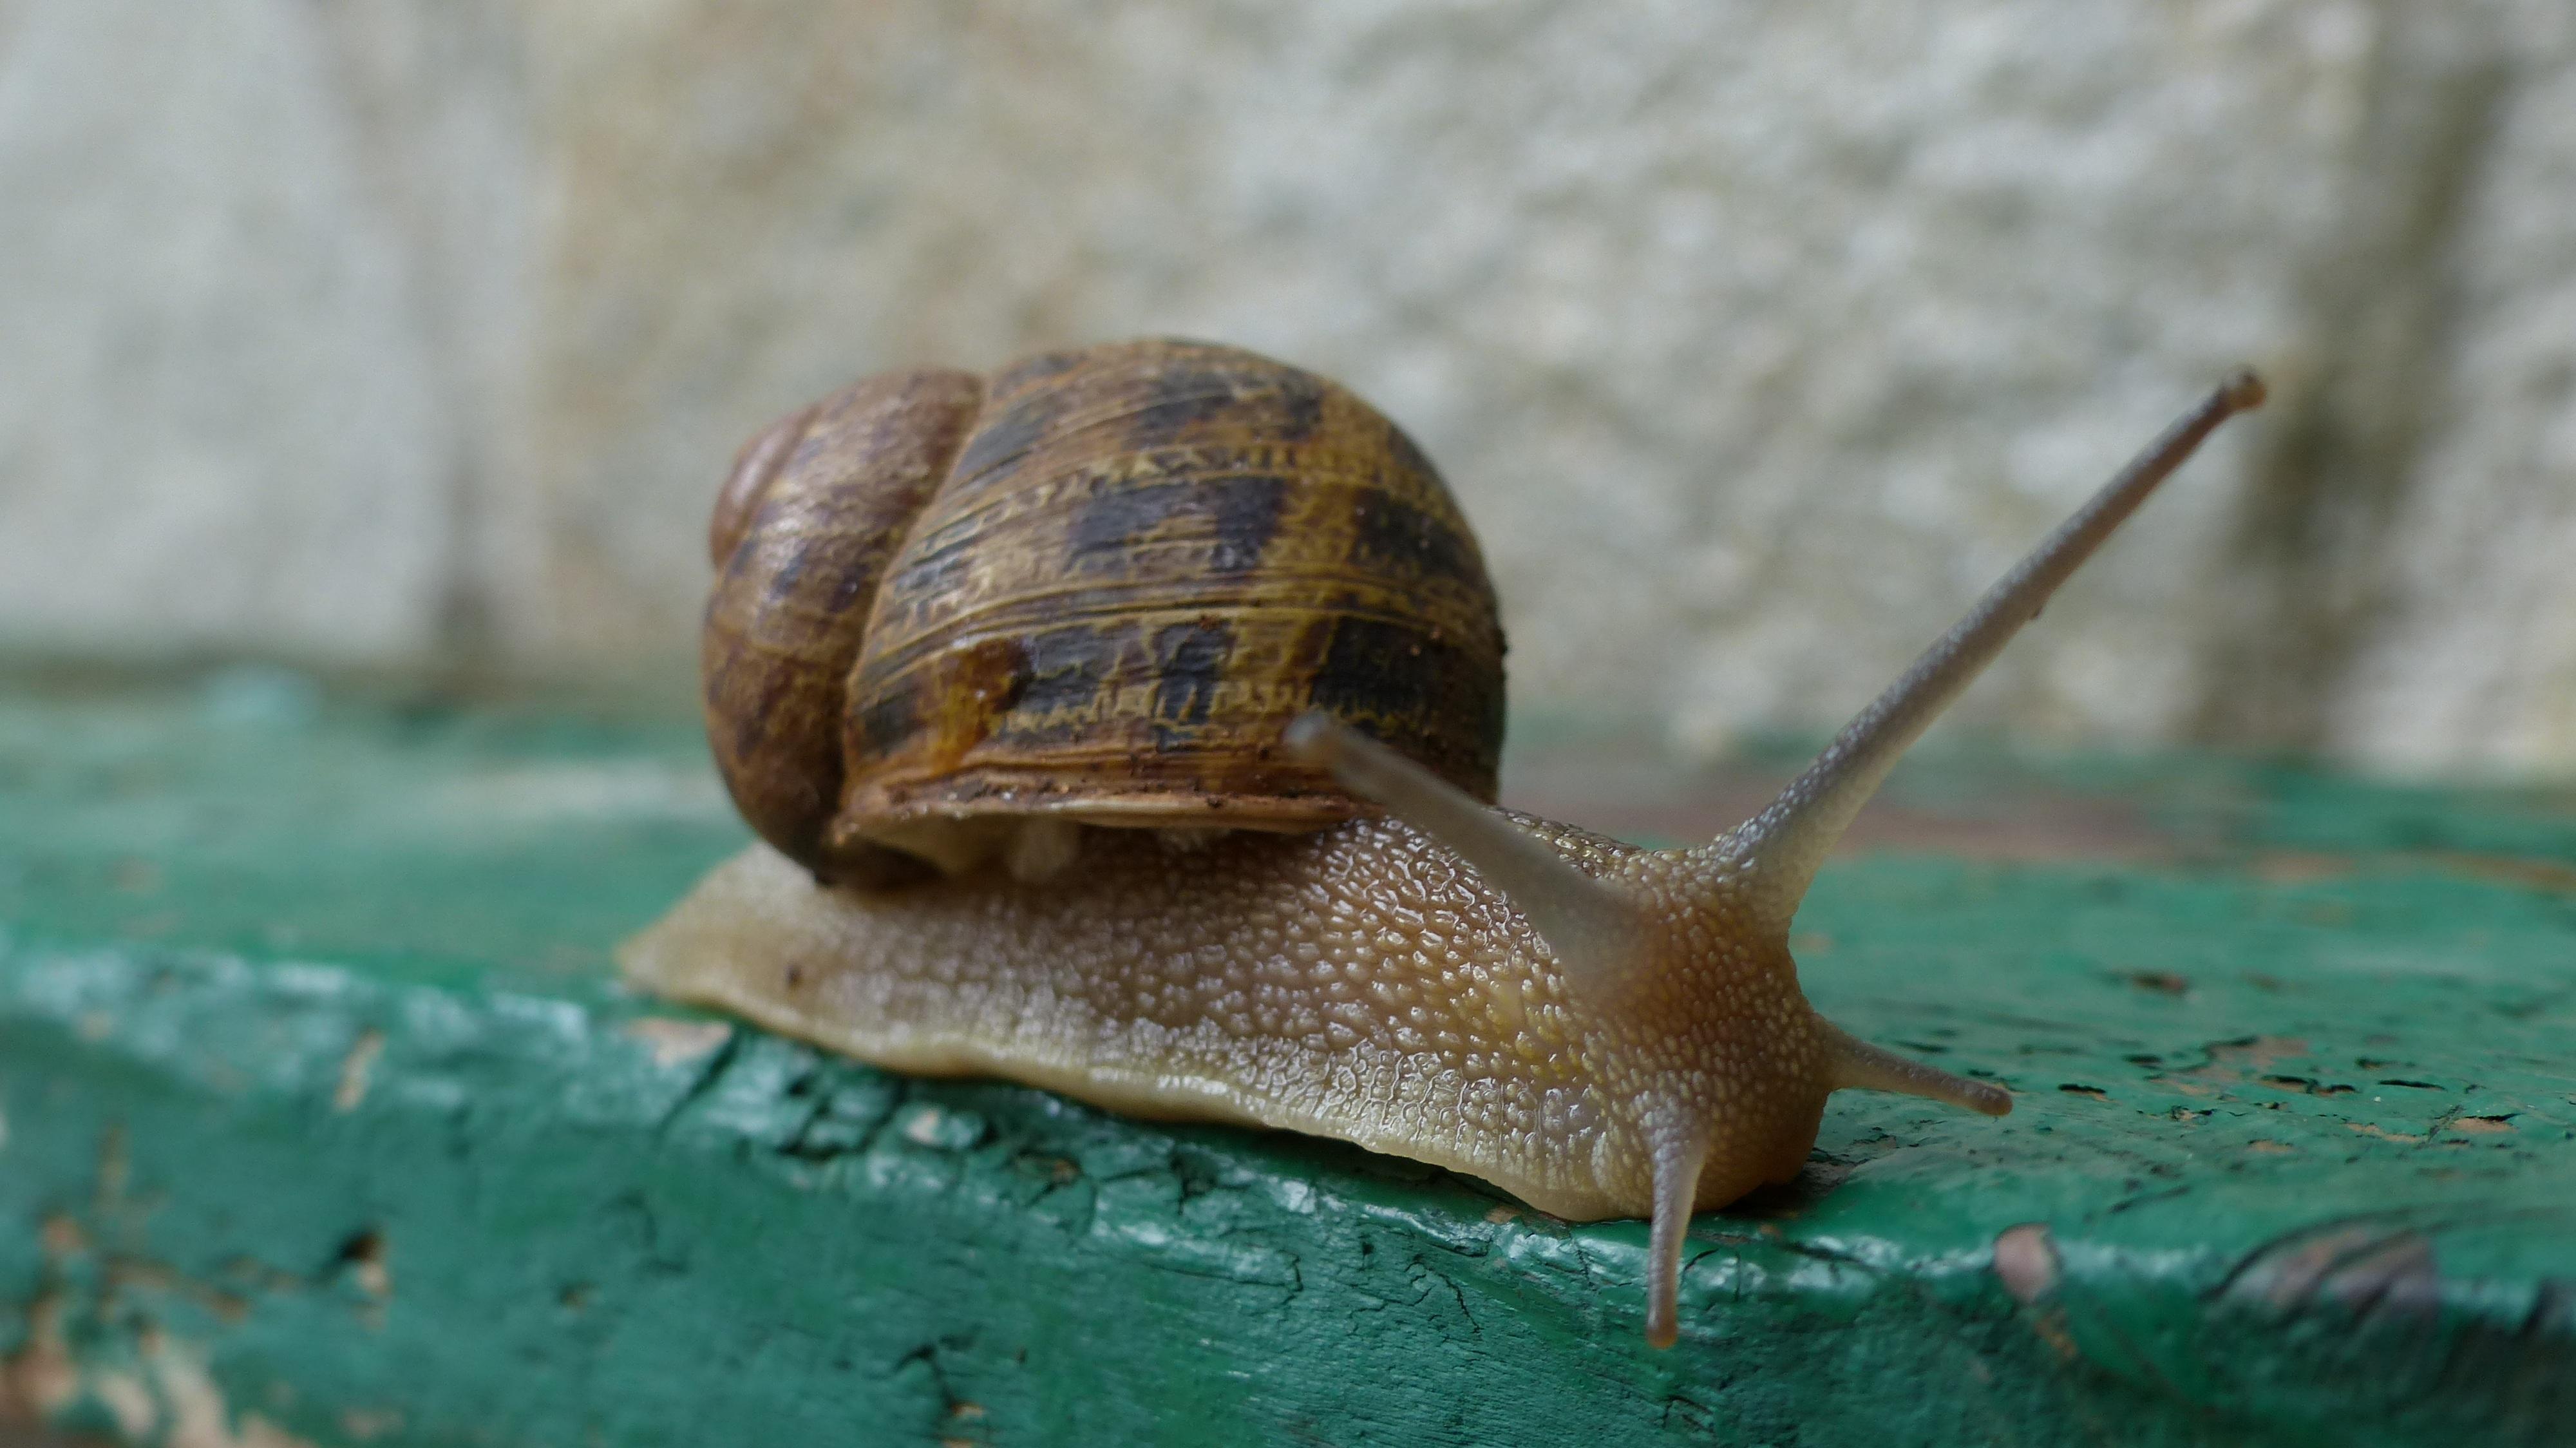 Kostenlose foto : Tier, Grün, Makro, Biologie, Garten, Fauna ...